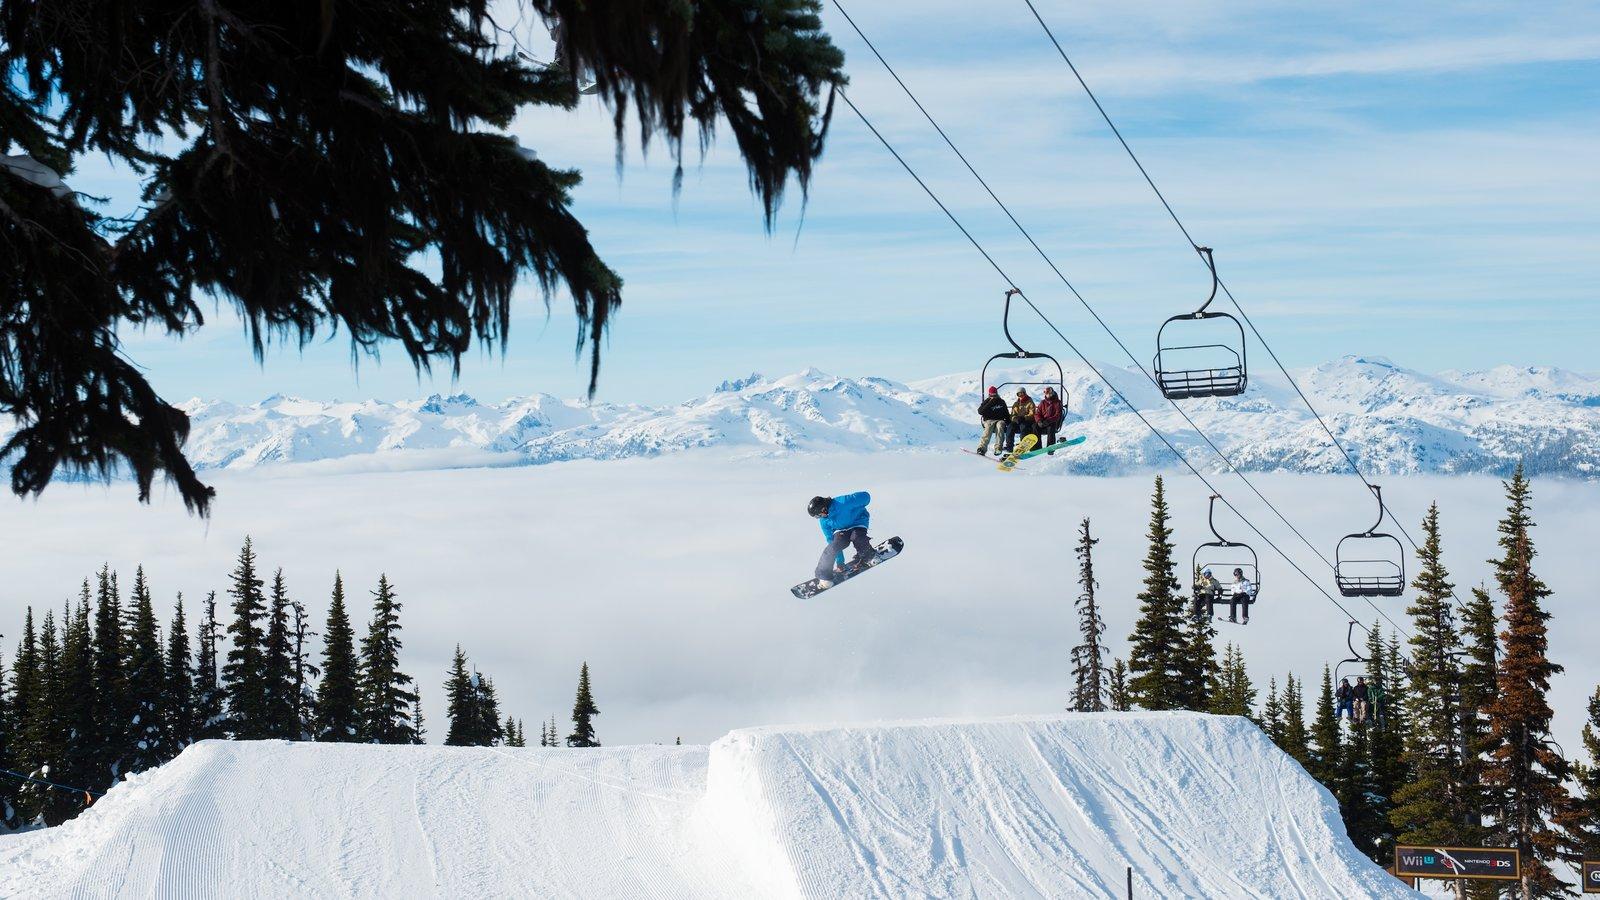 Whistler Blackcomb Ski Resort showing a gondola, snow and snow boarding